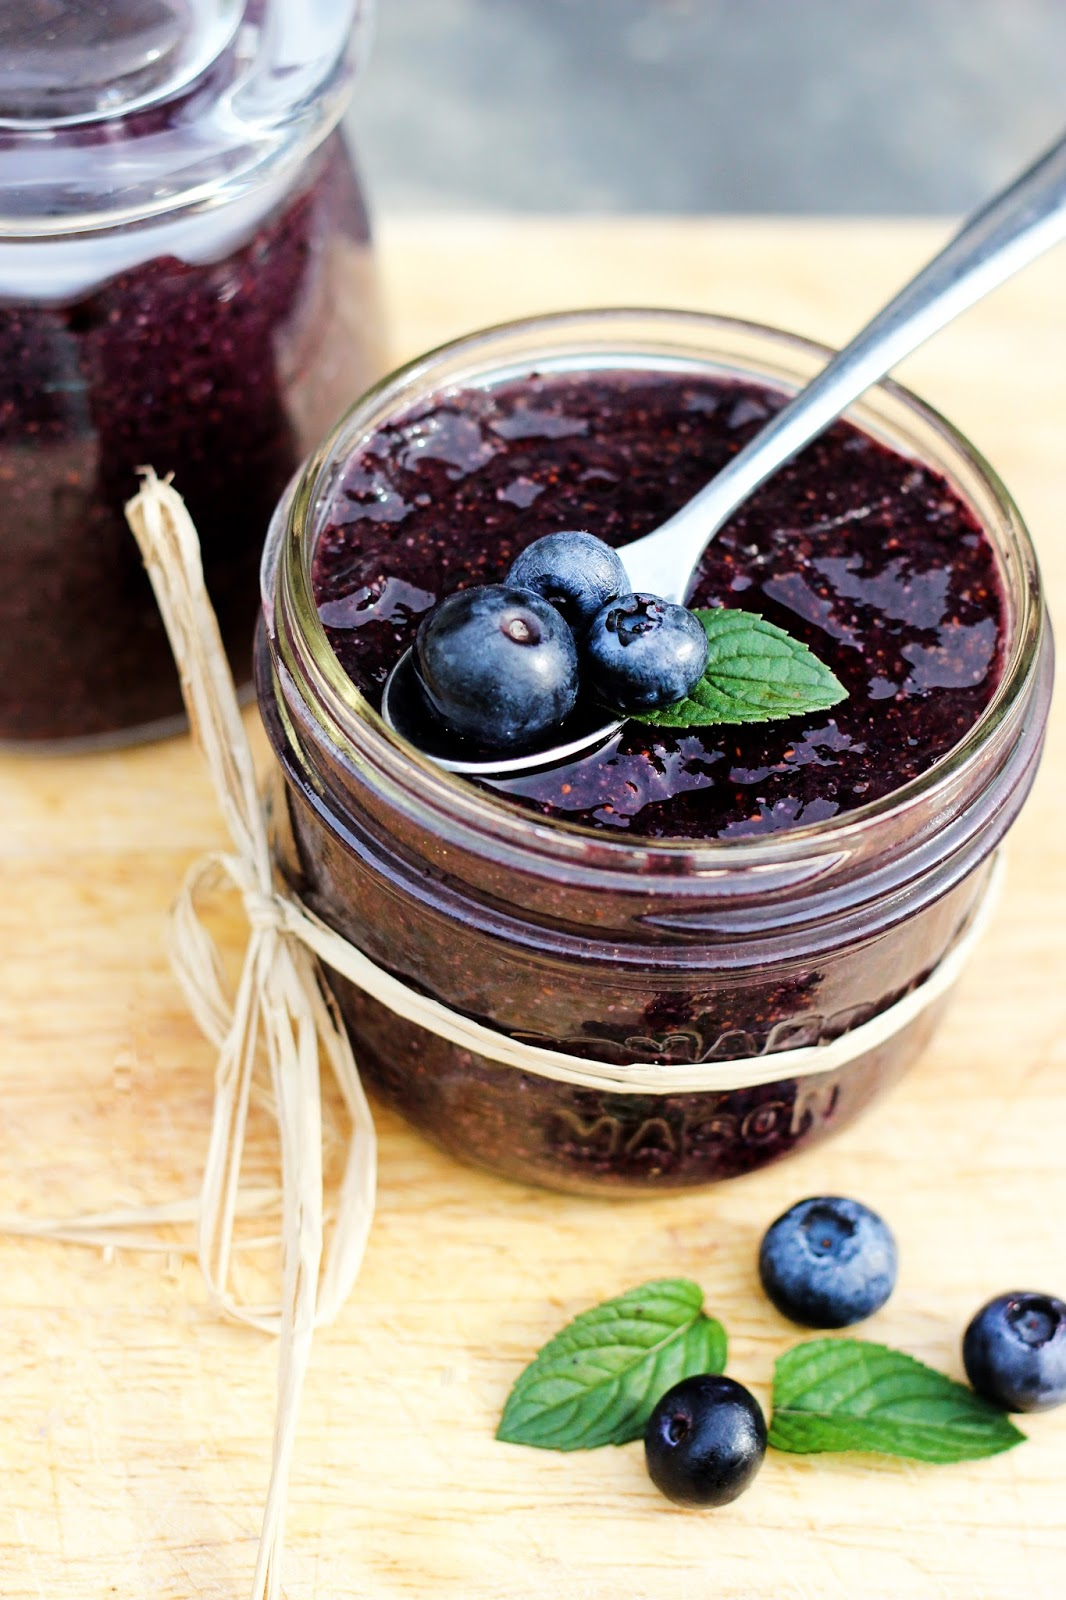 Food That's De!: Homemade Raw Blueberry Jam